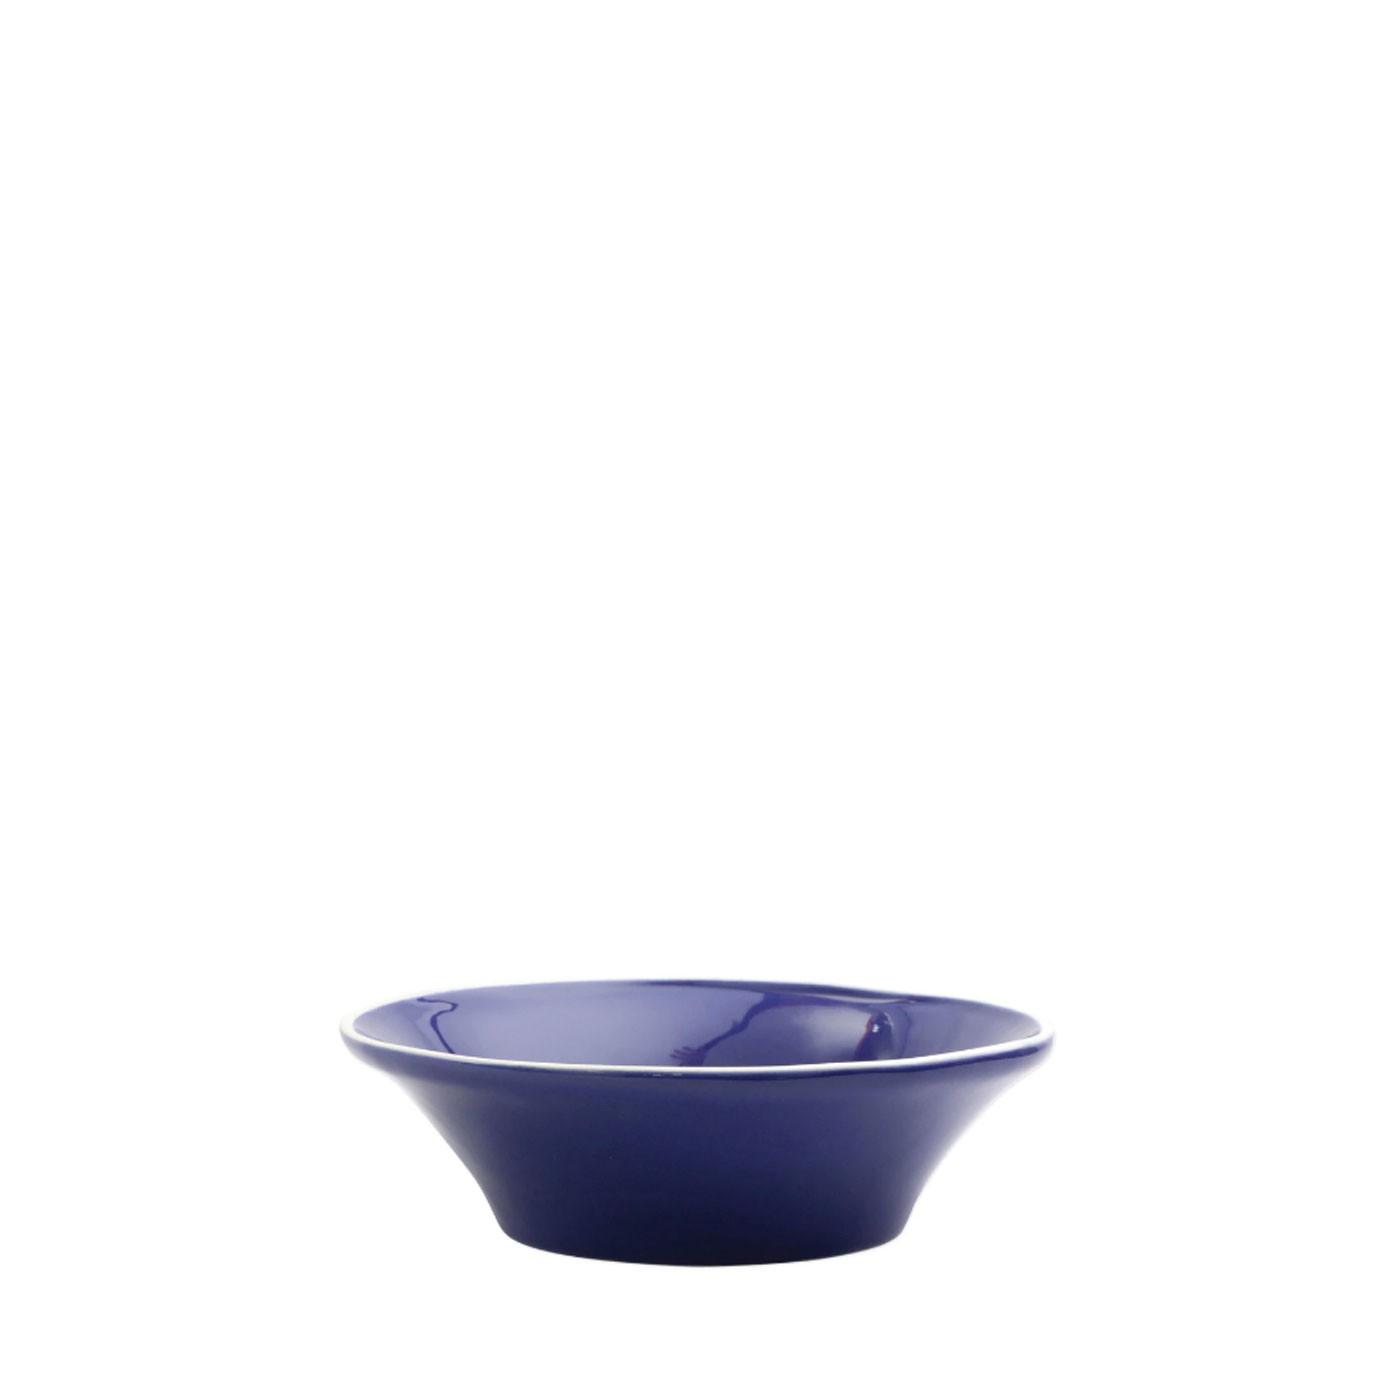 Chroma Blue Cereal Bowl